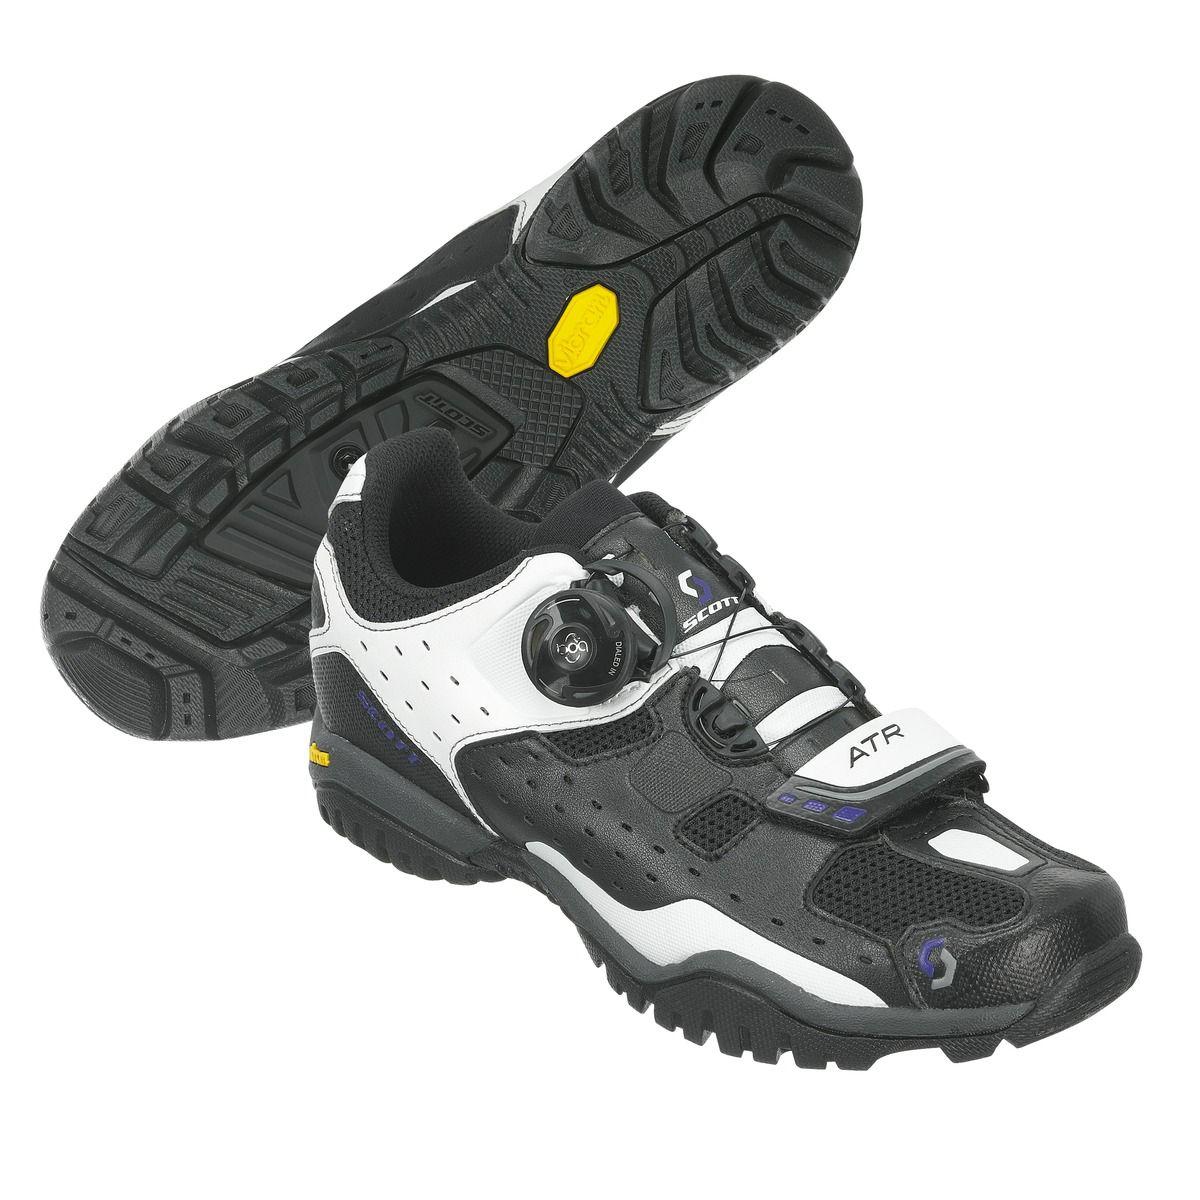 Shoe-A.T.R.-Lady-black